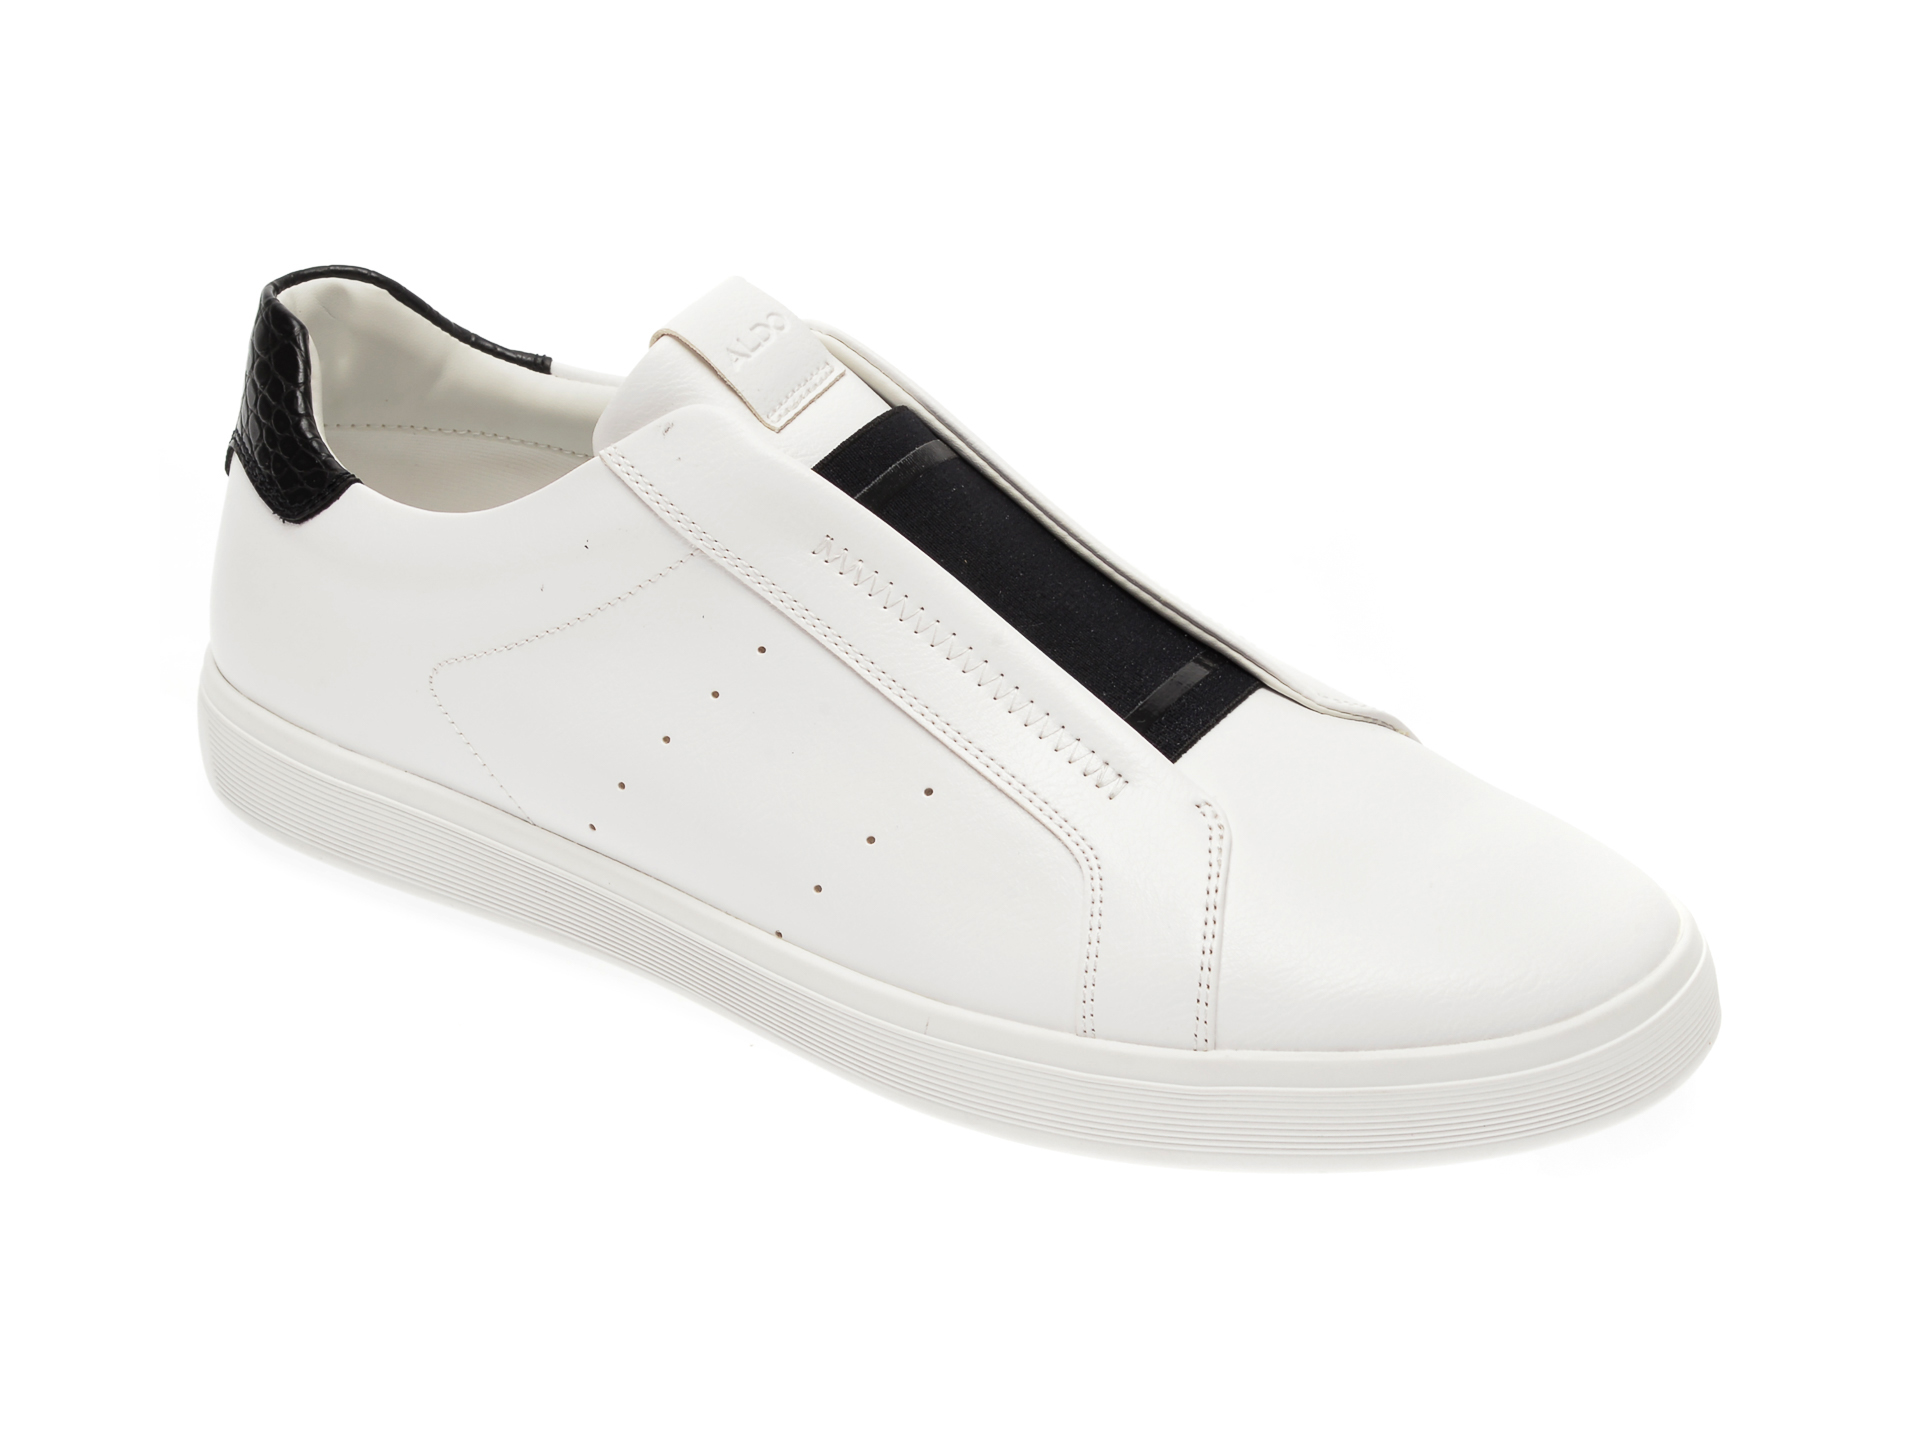 Pantofi ALDO albi, Boomerang100, din piele ecologica imagine otter.ro